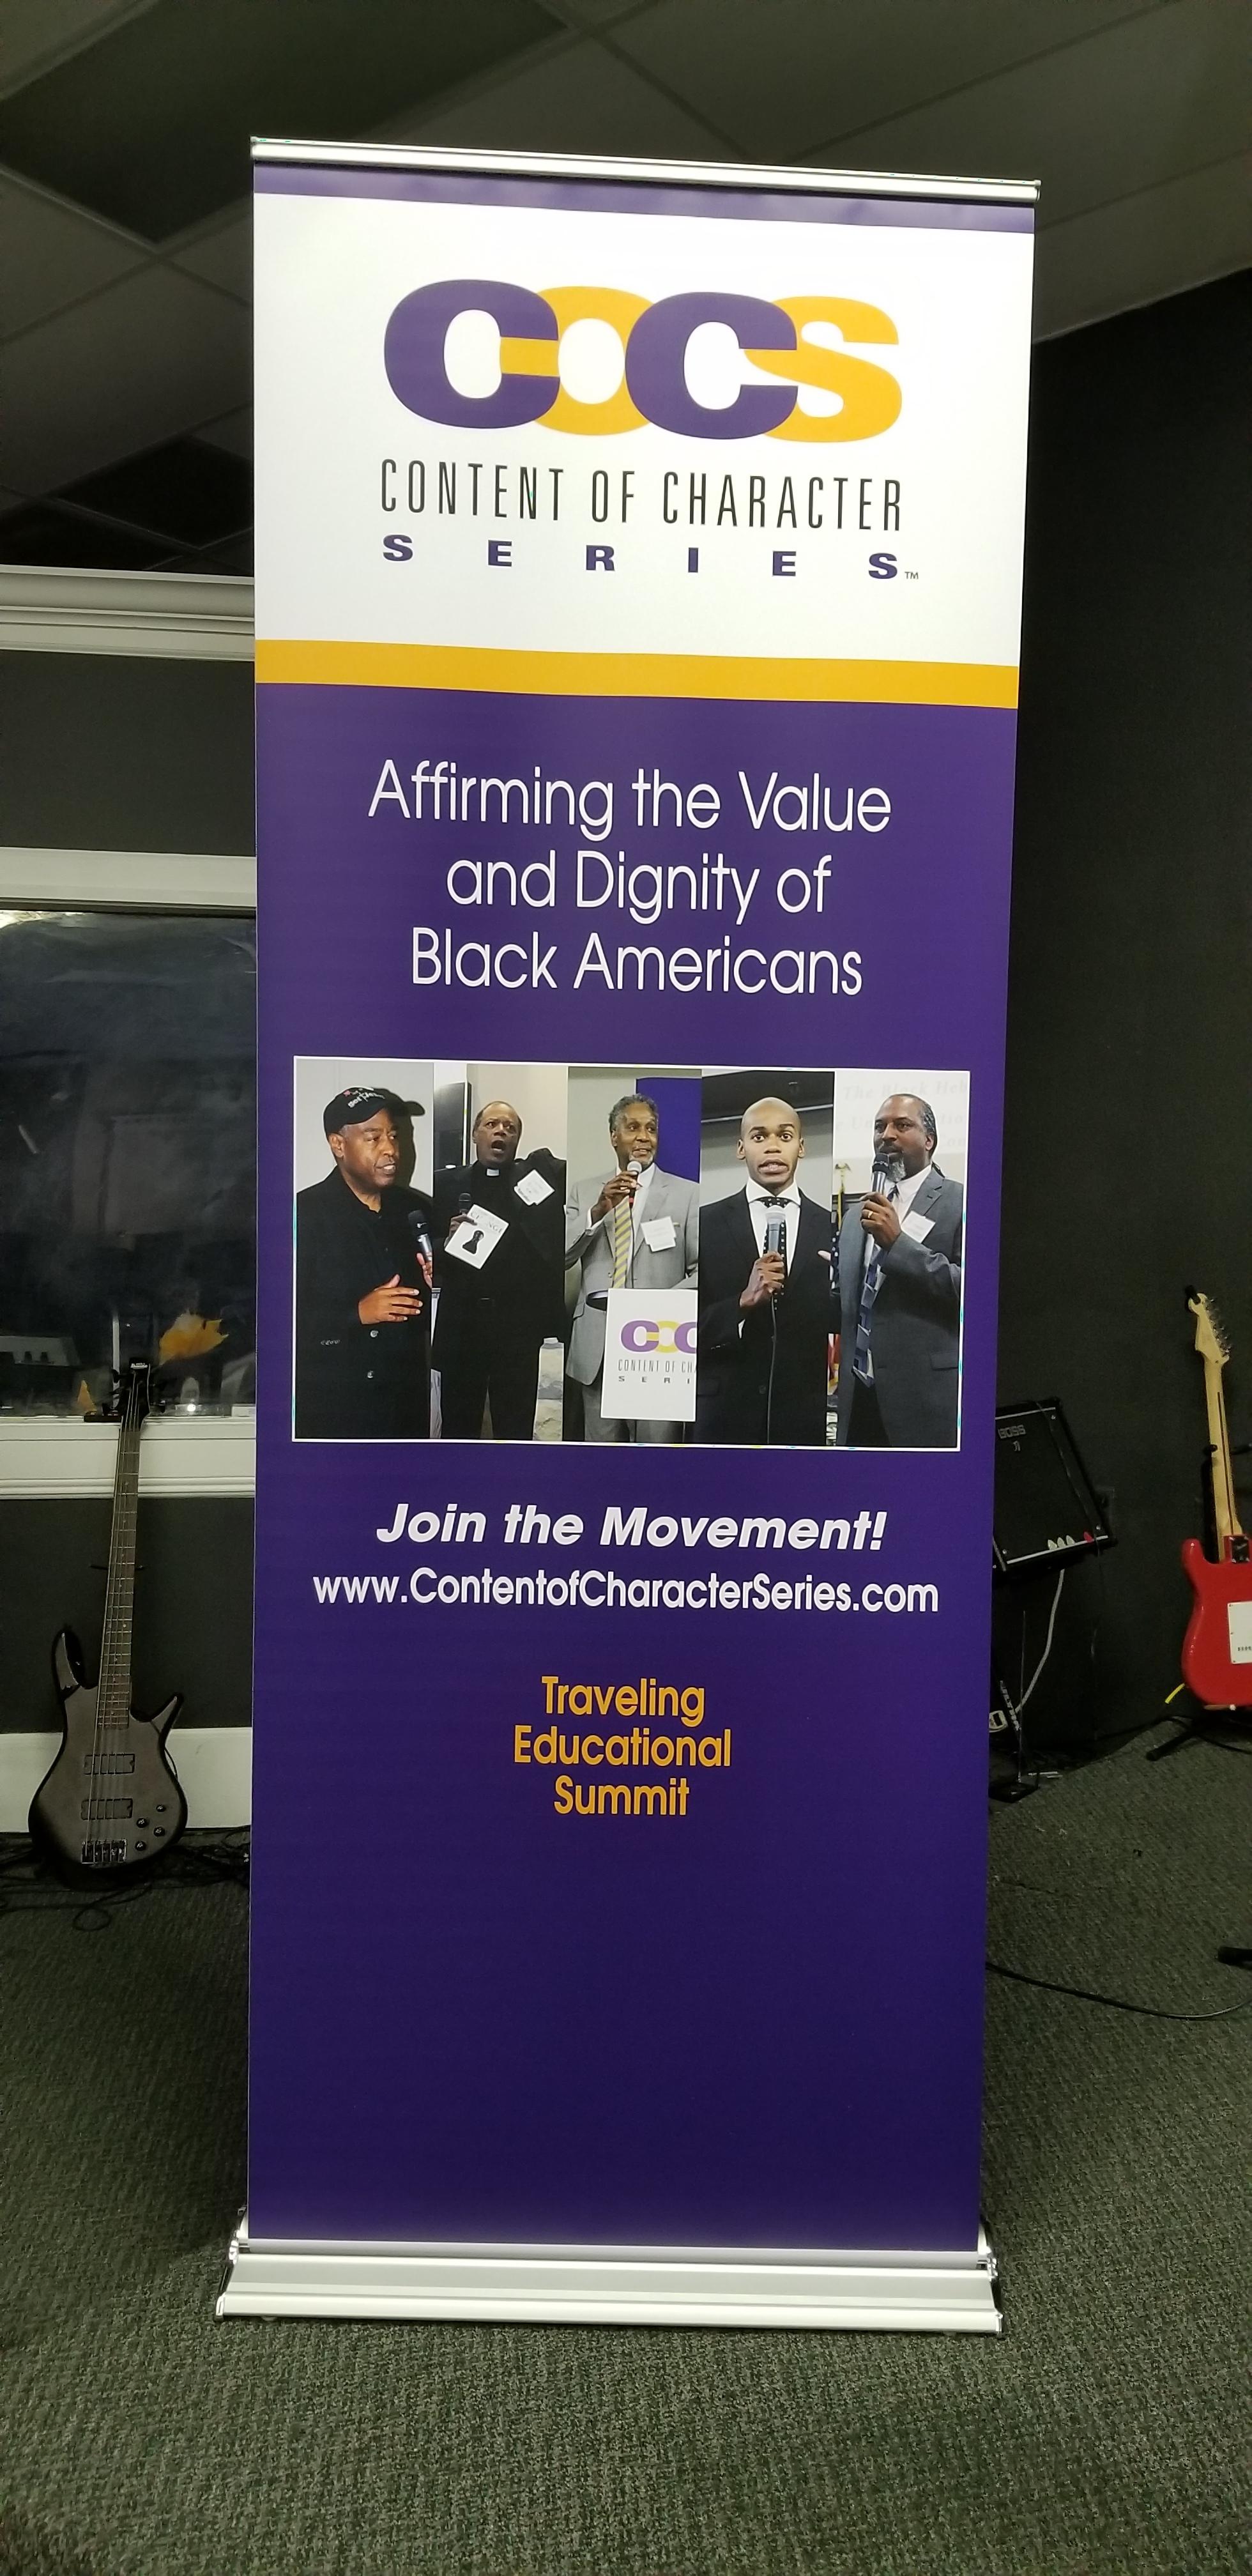 COCS Banner